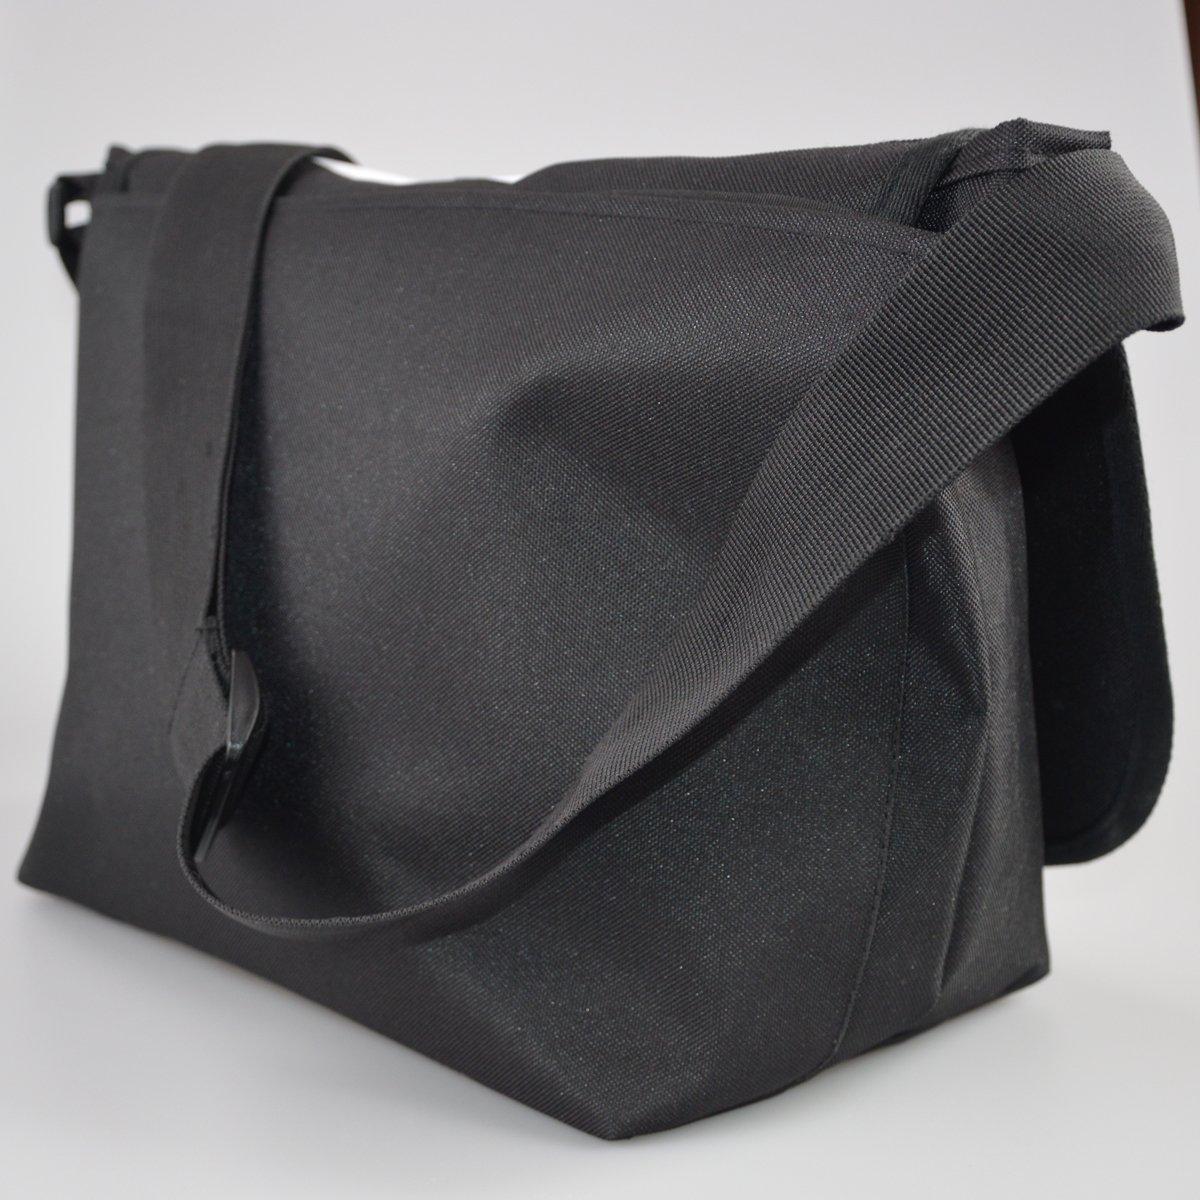 Lov6eoorheeb Unisex Coat Of Arms Of Czech Republic Wide Diagonal Shoulder Bag Adjustable Shoulder Tote Bag Single Shoulder Backpack For Work,School,Daily by Lov6eoorheeb (Image #4)